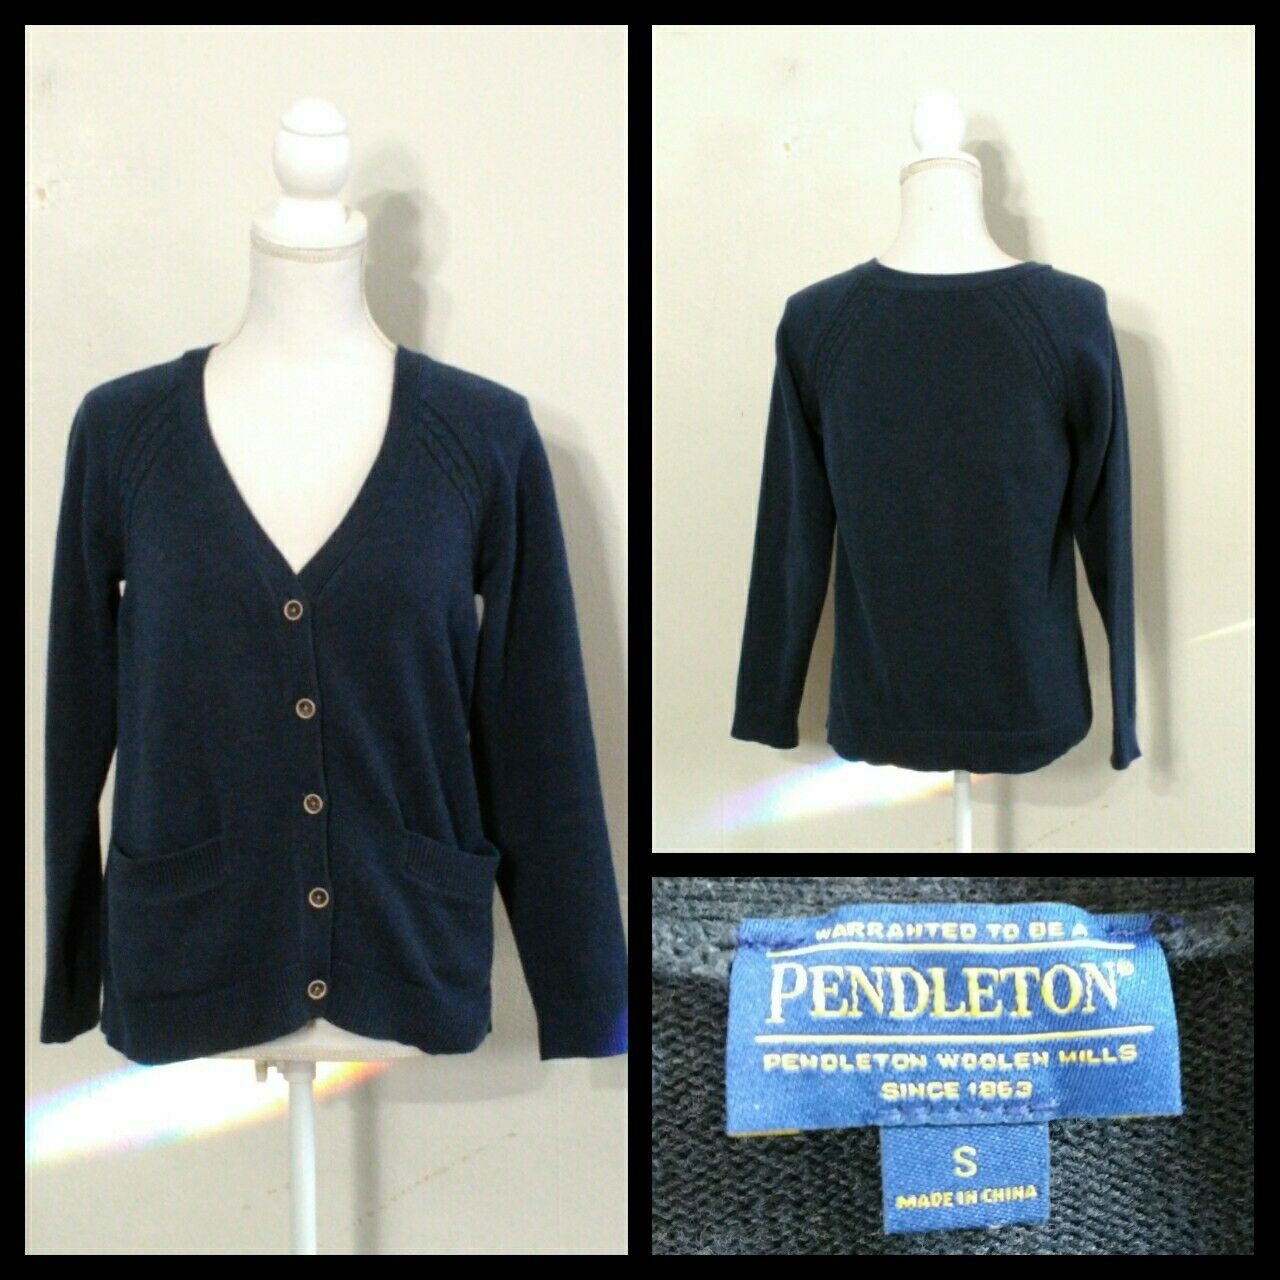 Pendleton Vintage Cardigan Sweater Women's Sm. bluee Button-Up Inv S9752